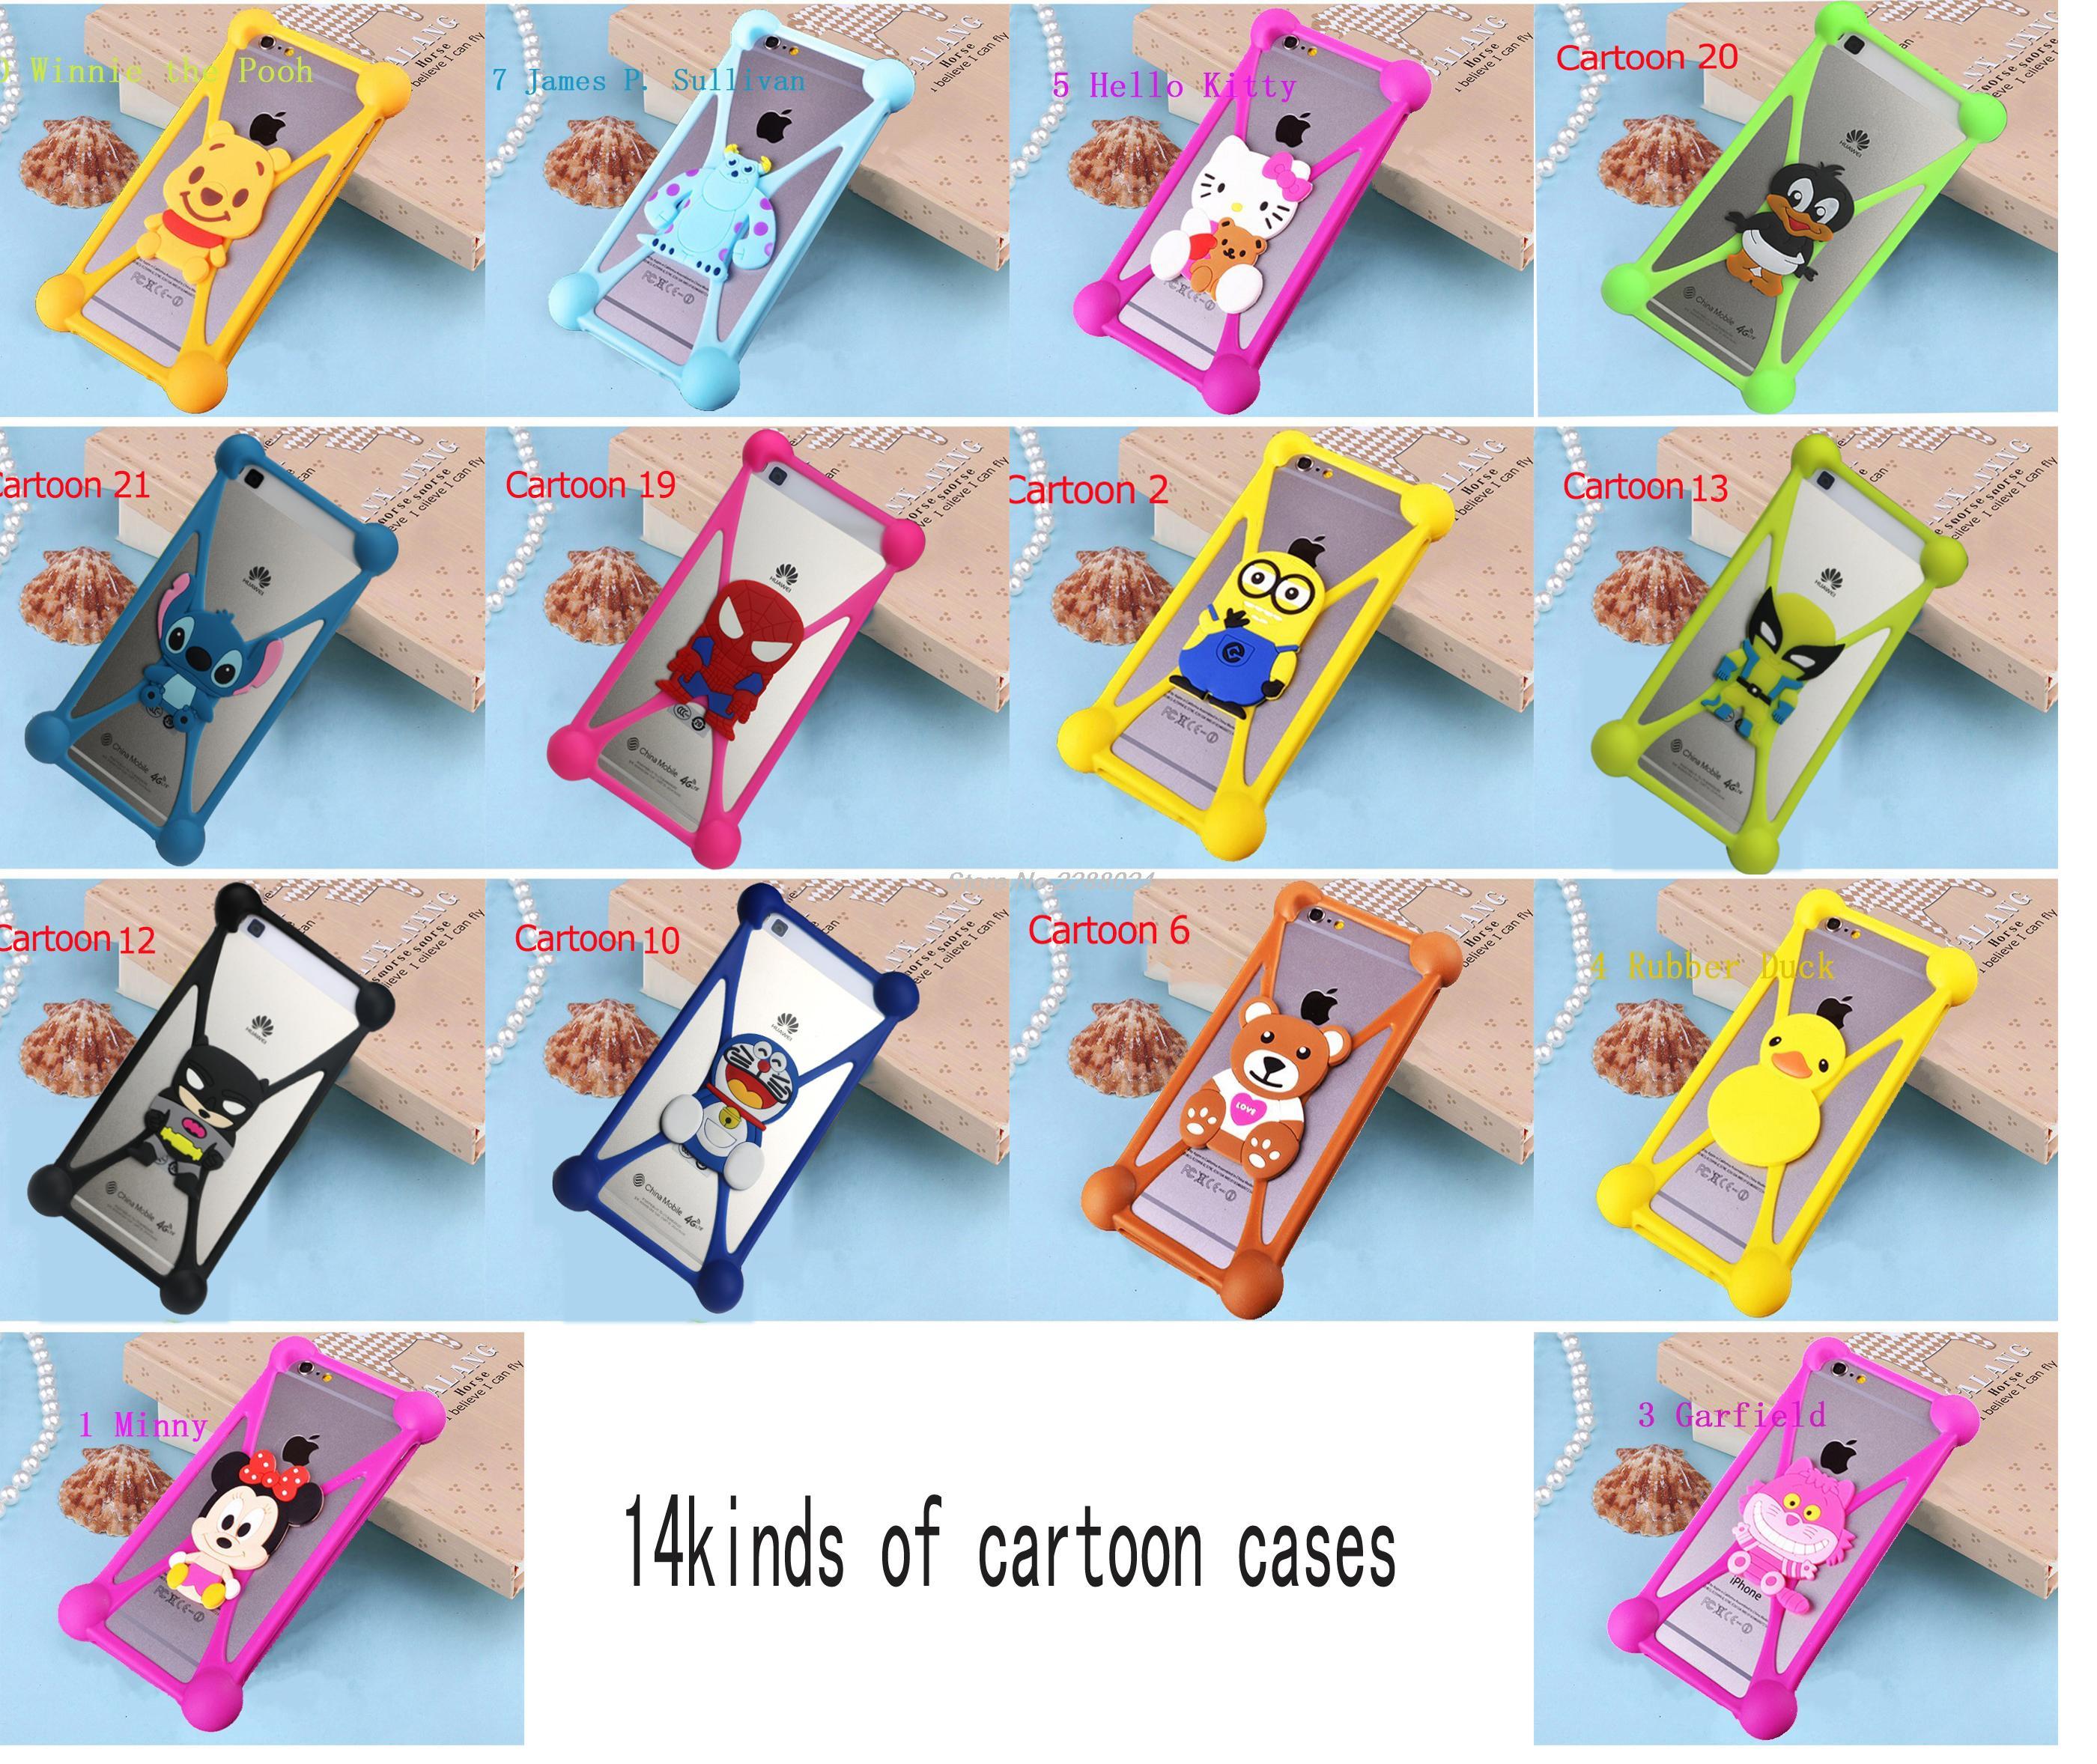 3D Cartoon Hello Kitty Stitch Minnie Minions Sully Silicone Case For Prestigio Muze D3 PSP3530 DUO 3530 Duo(China (Mainland))